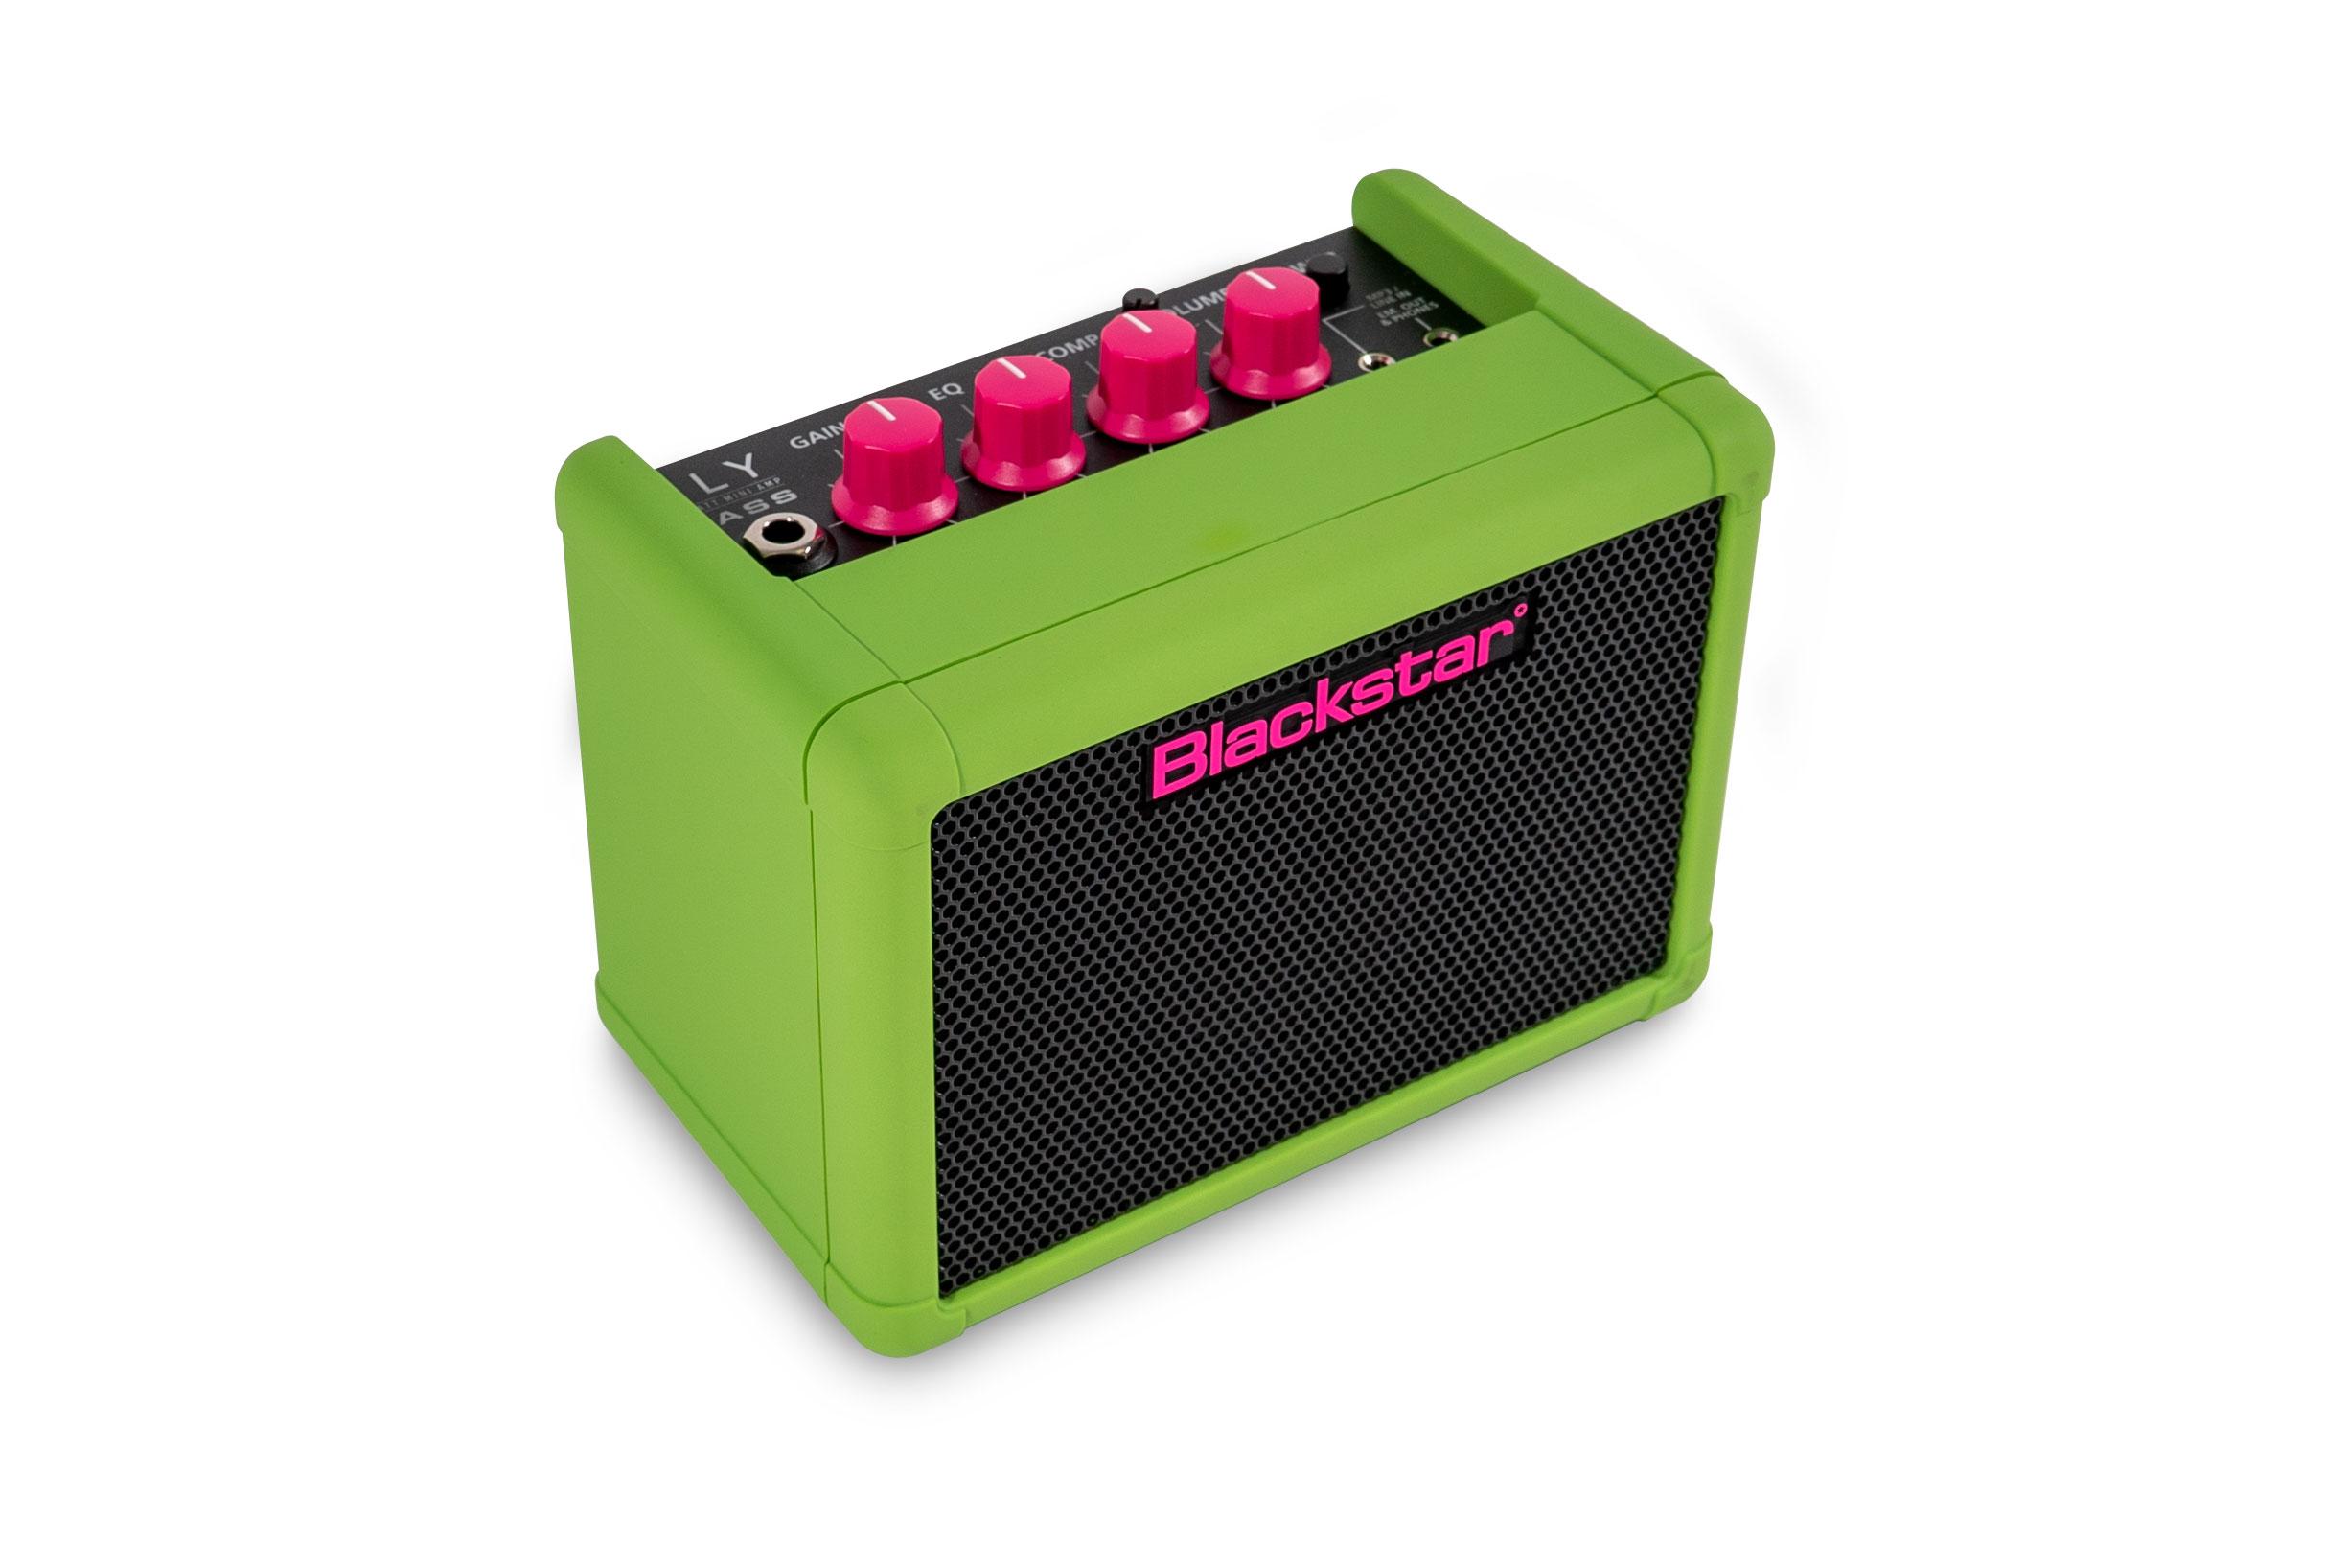 BLACKSTAR-FLY-3-BASS-Neon-Green-sku-65298653881